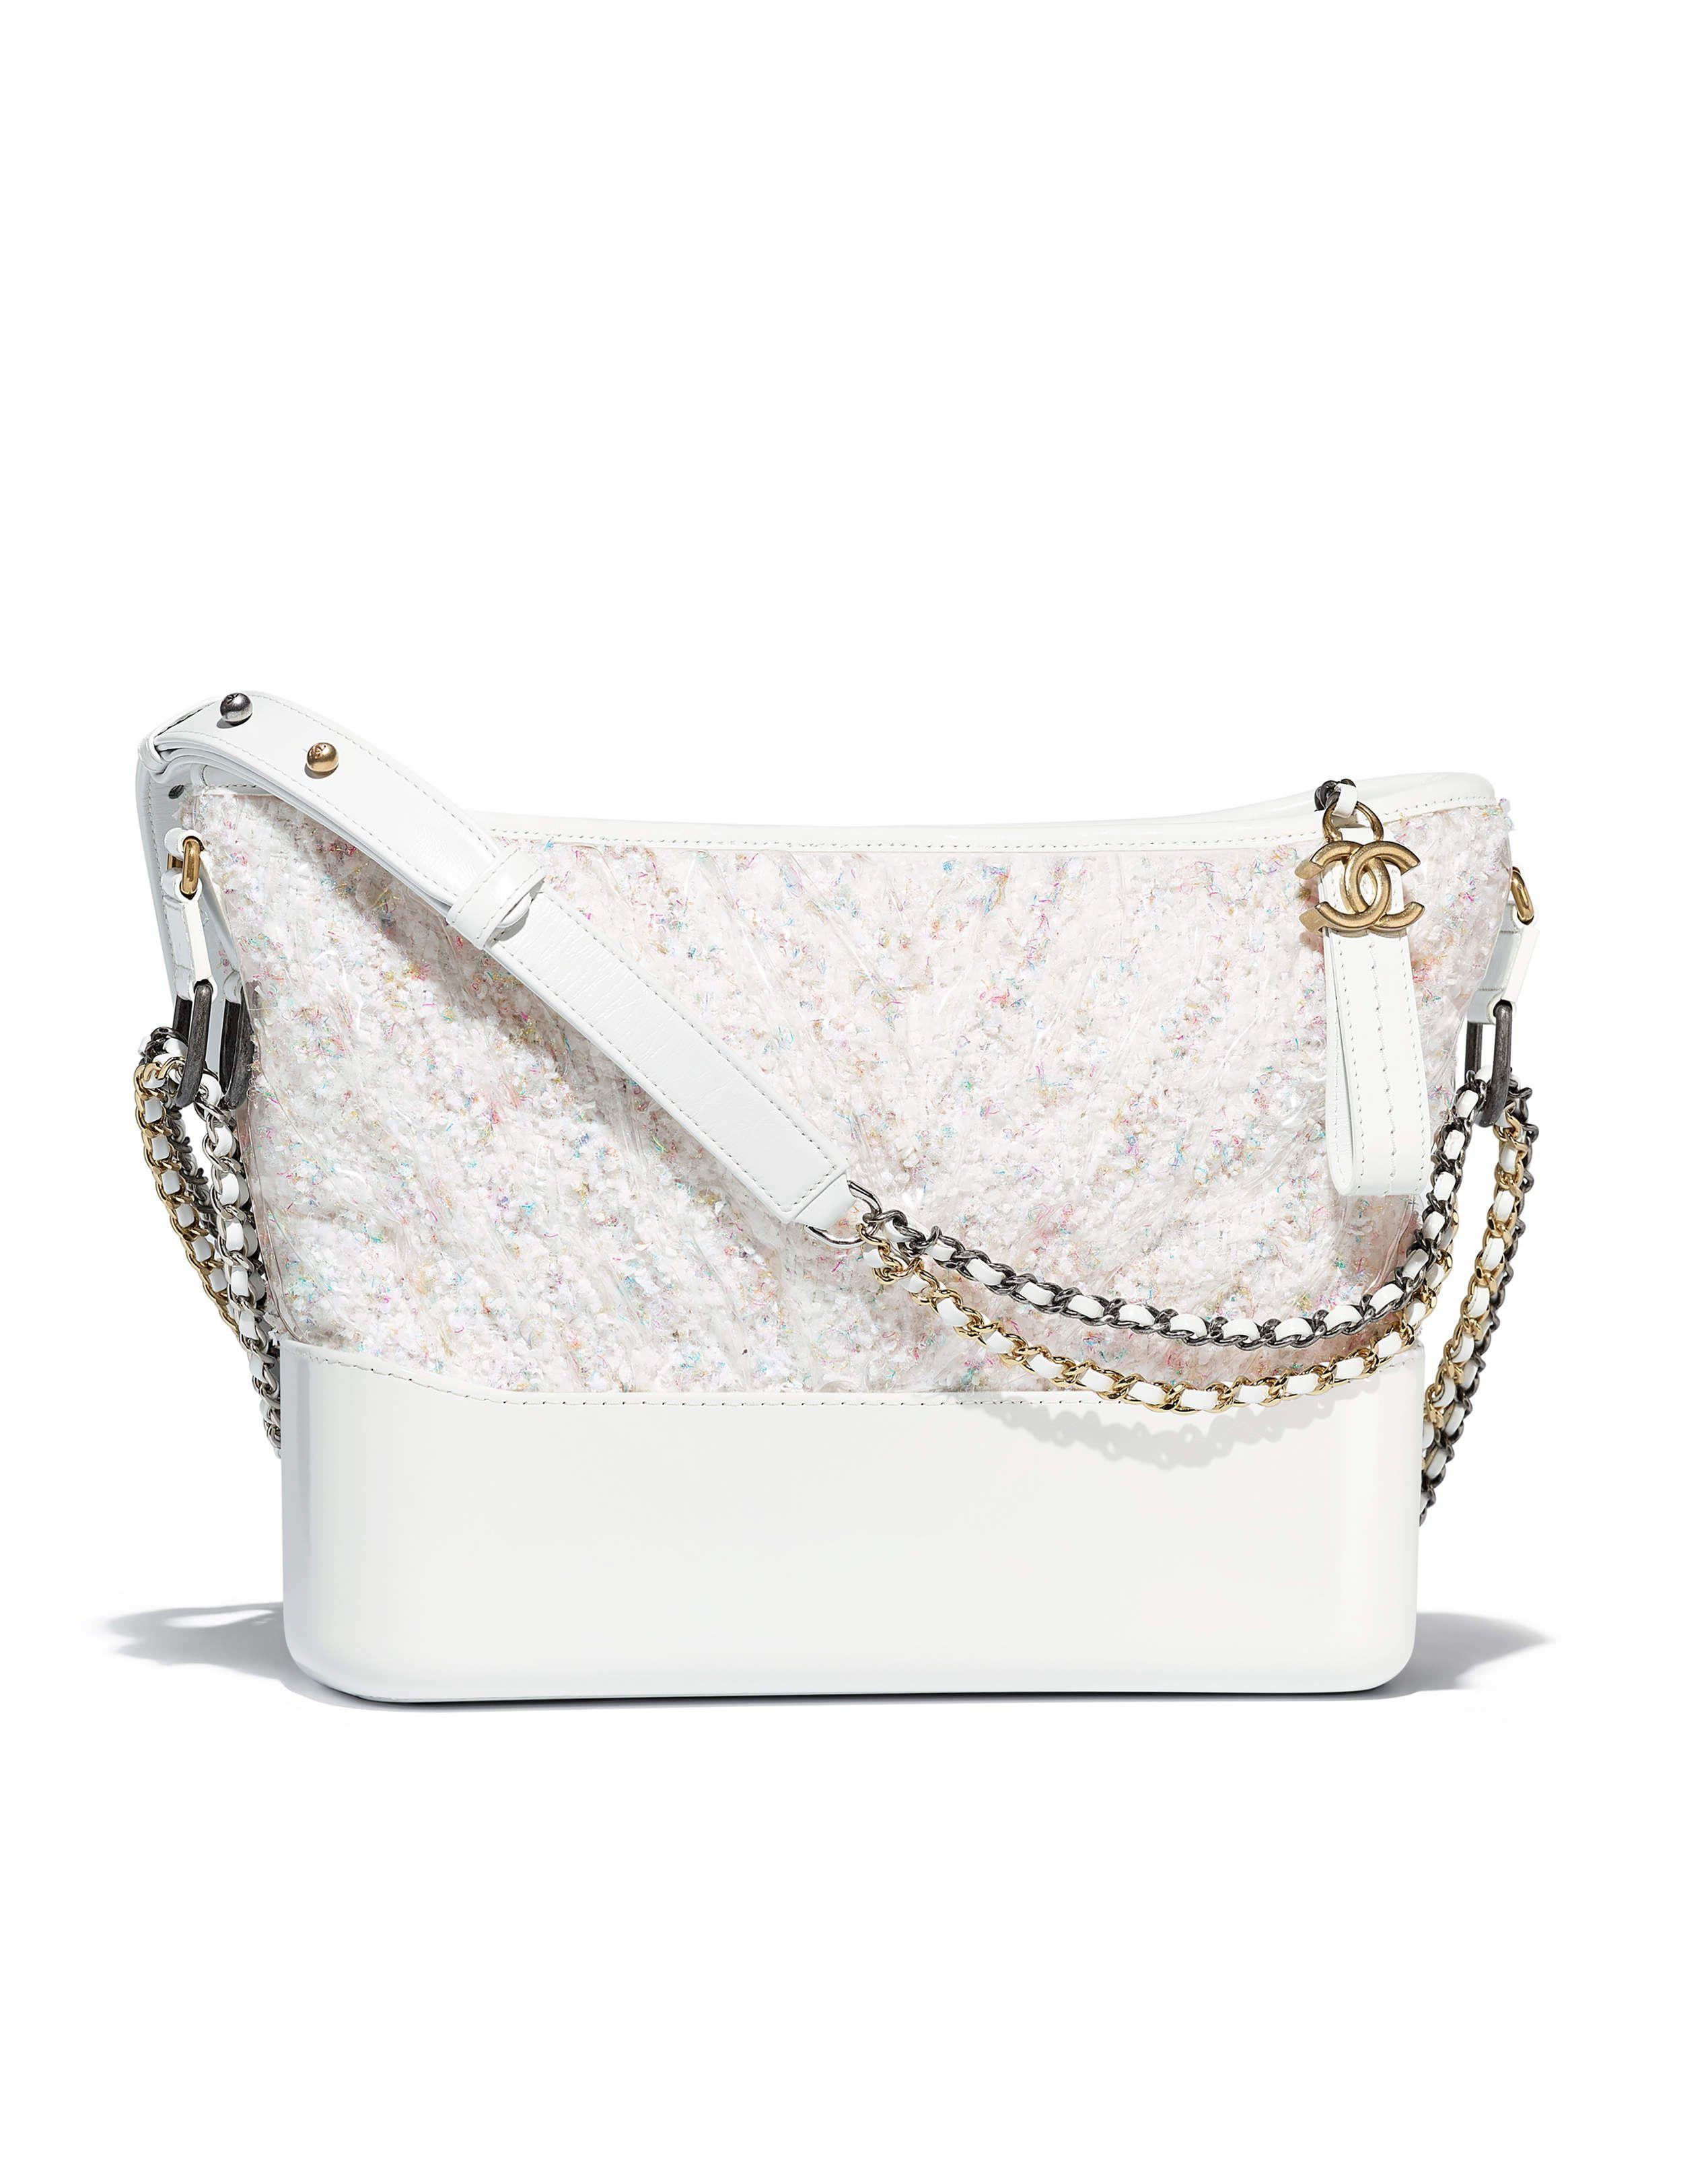 6c9bd032cf Chanel - SS2018 | White tweed Chanel's Gabrielle Hobo bag | BAGS ...